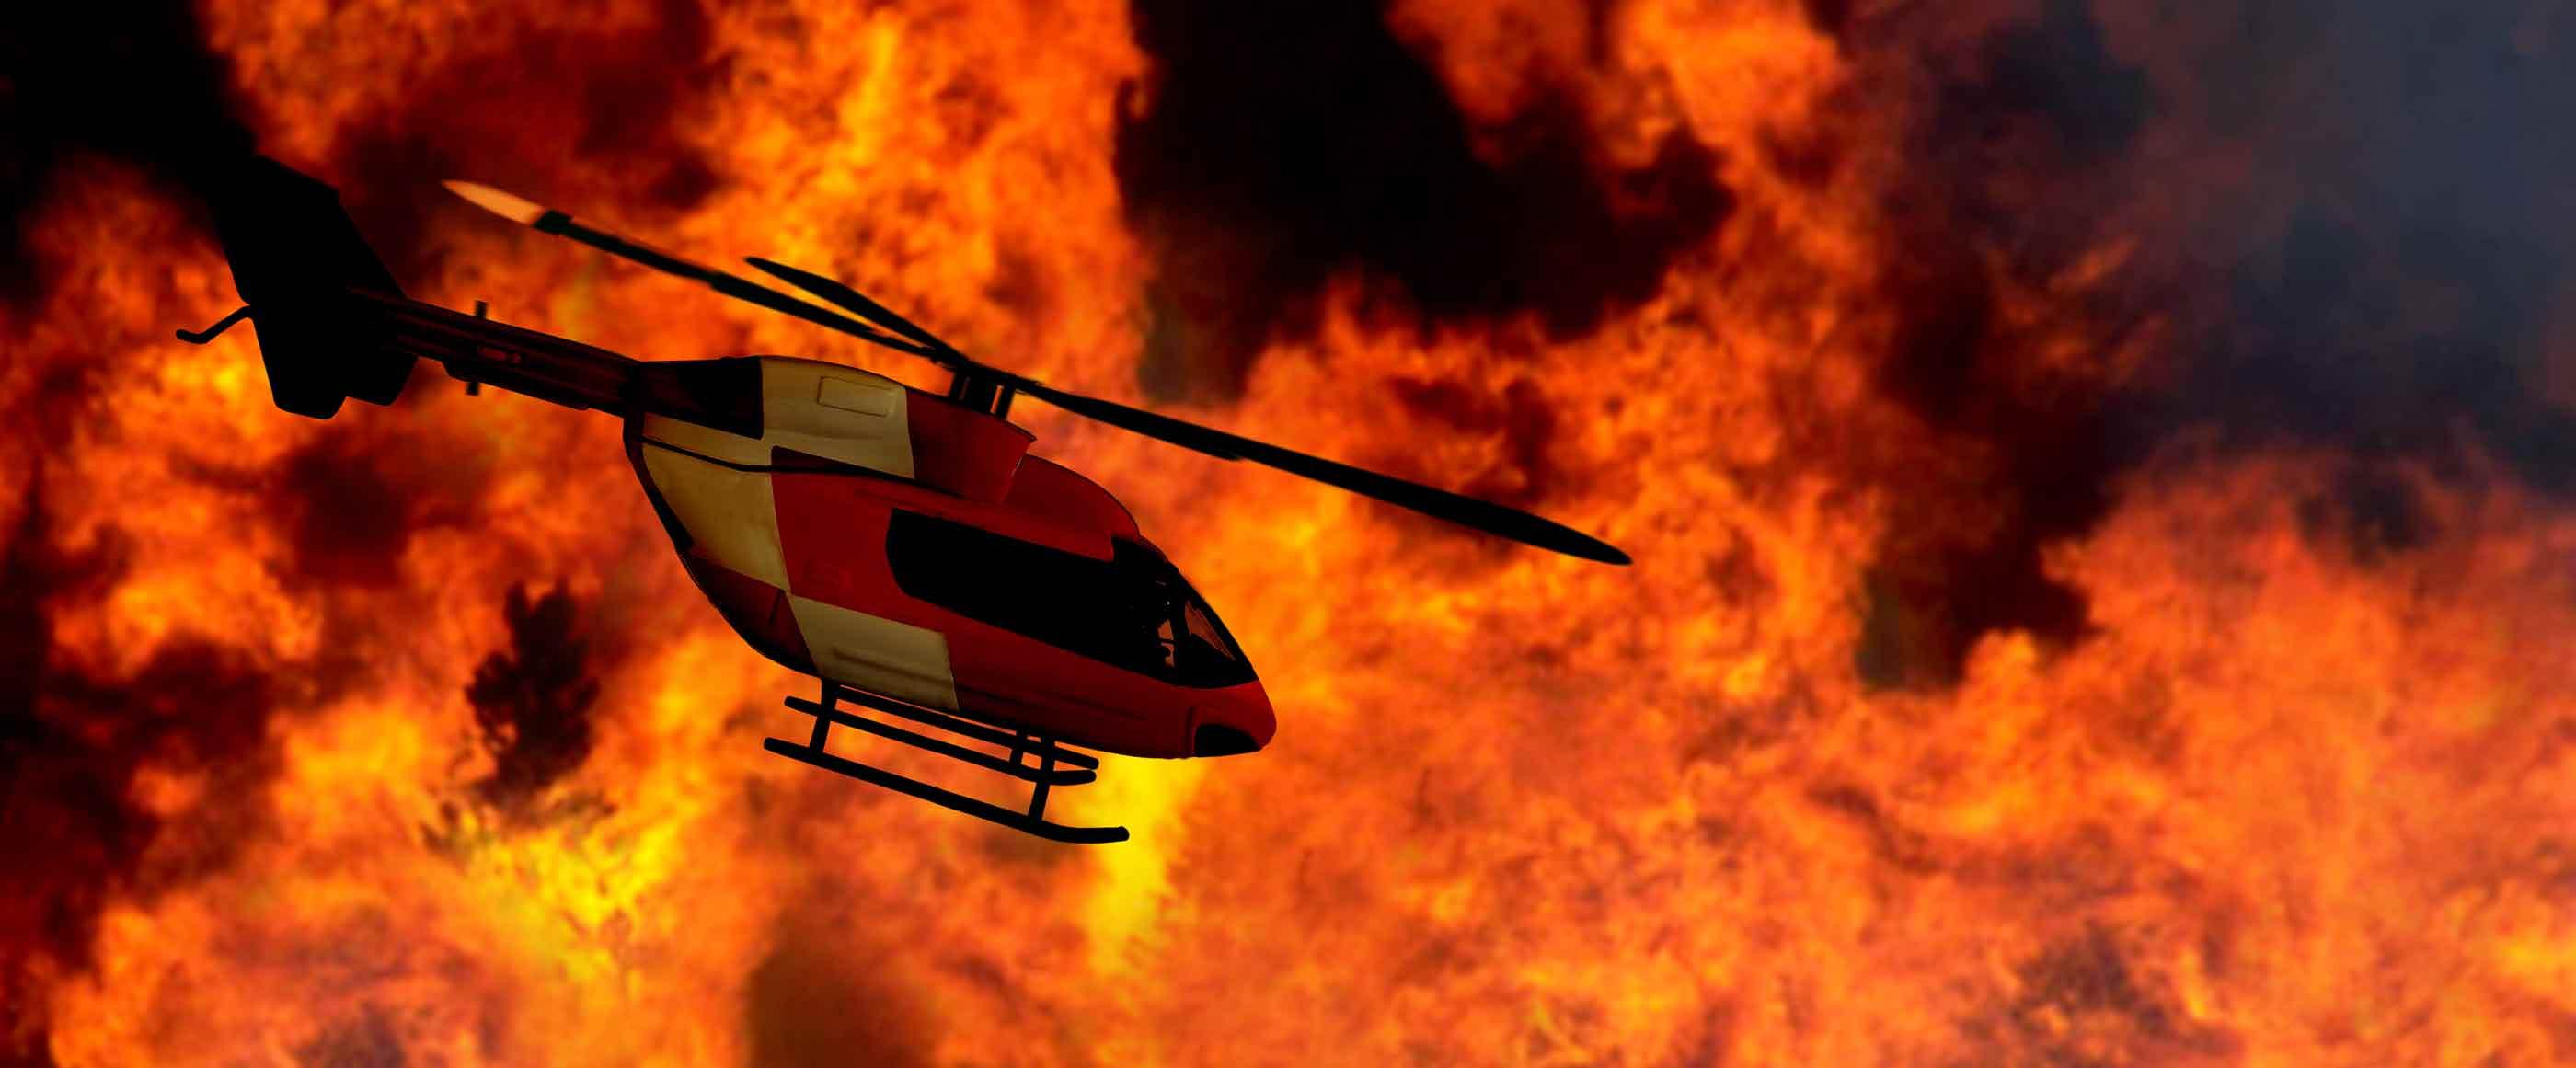 bushfire - photo #29